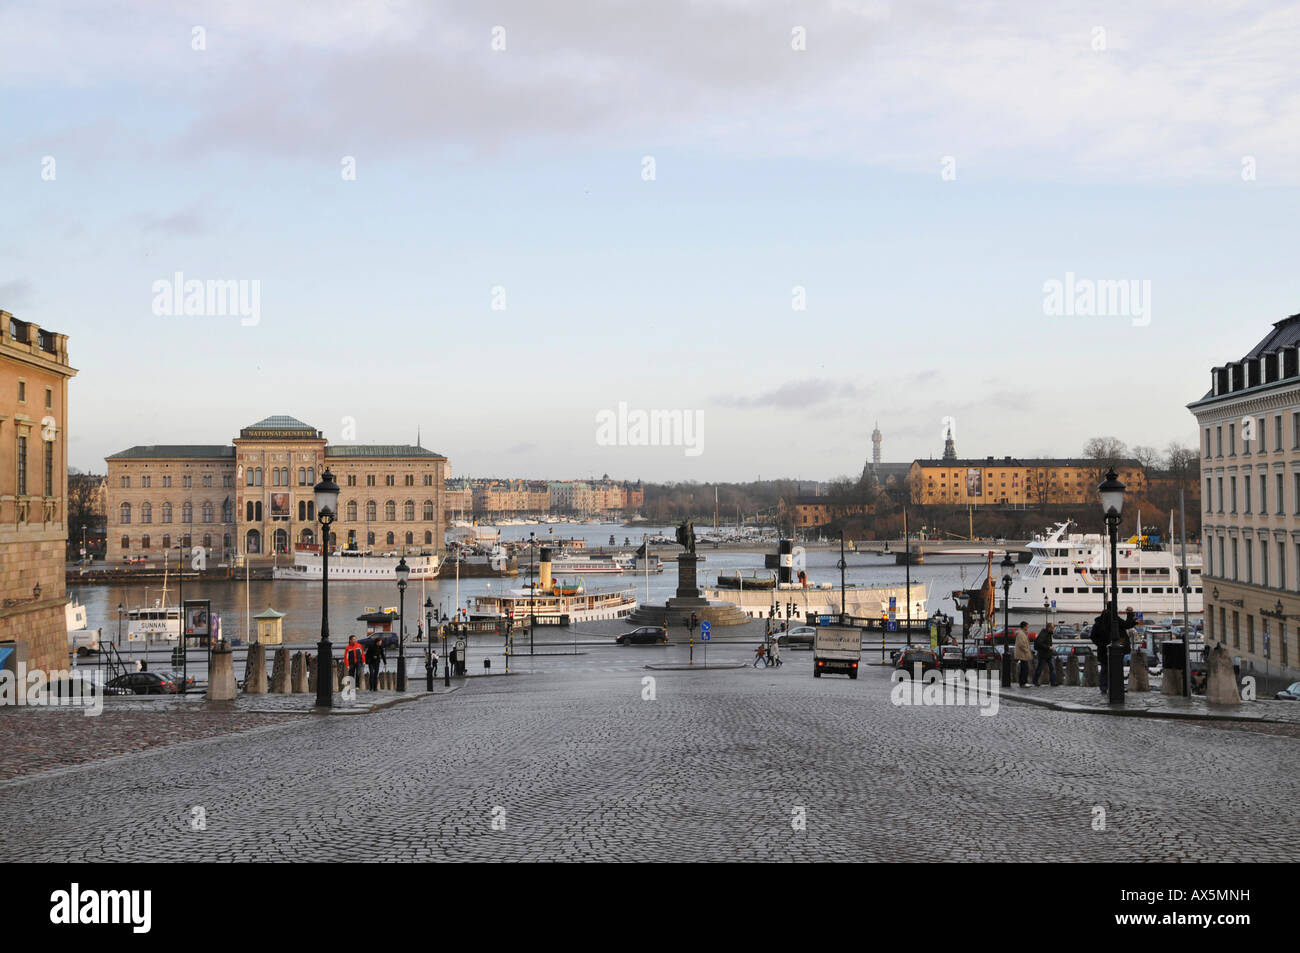 National Museum (left) and the Moderna Museum (right), Slottsbacken, Gamla Stan, Stockholm, Sweden, Scandinavia, - Stock Image